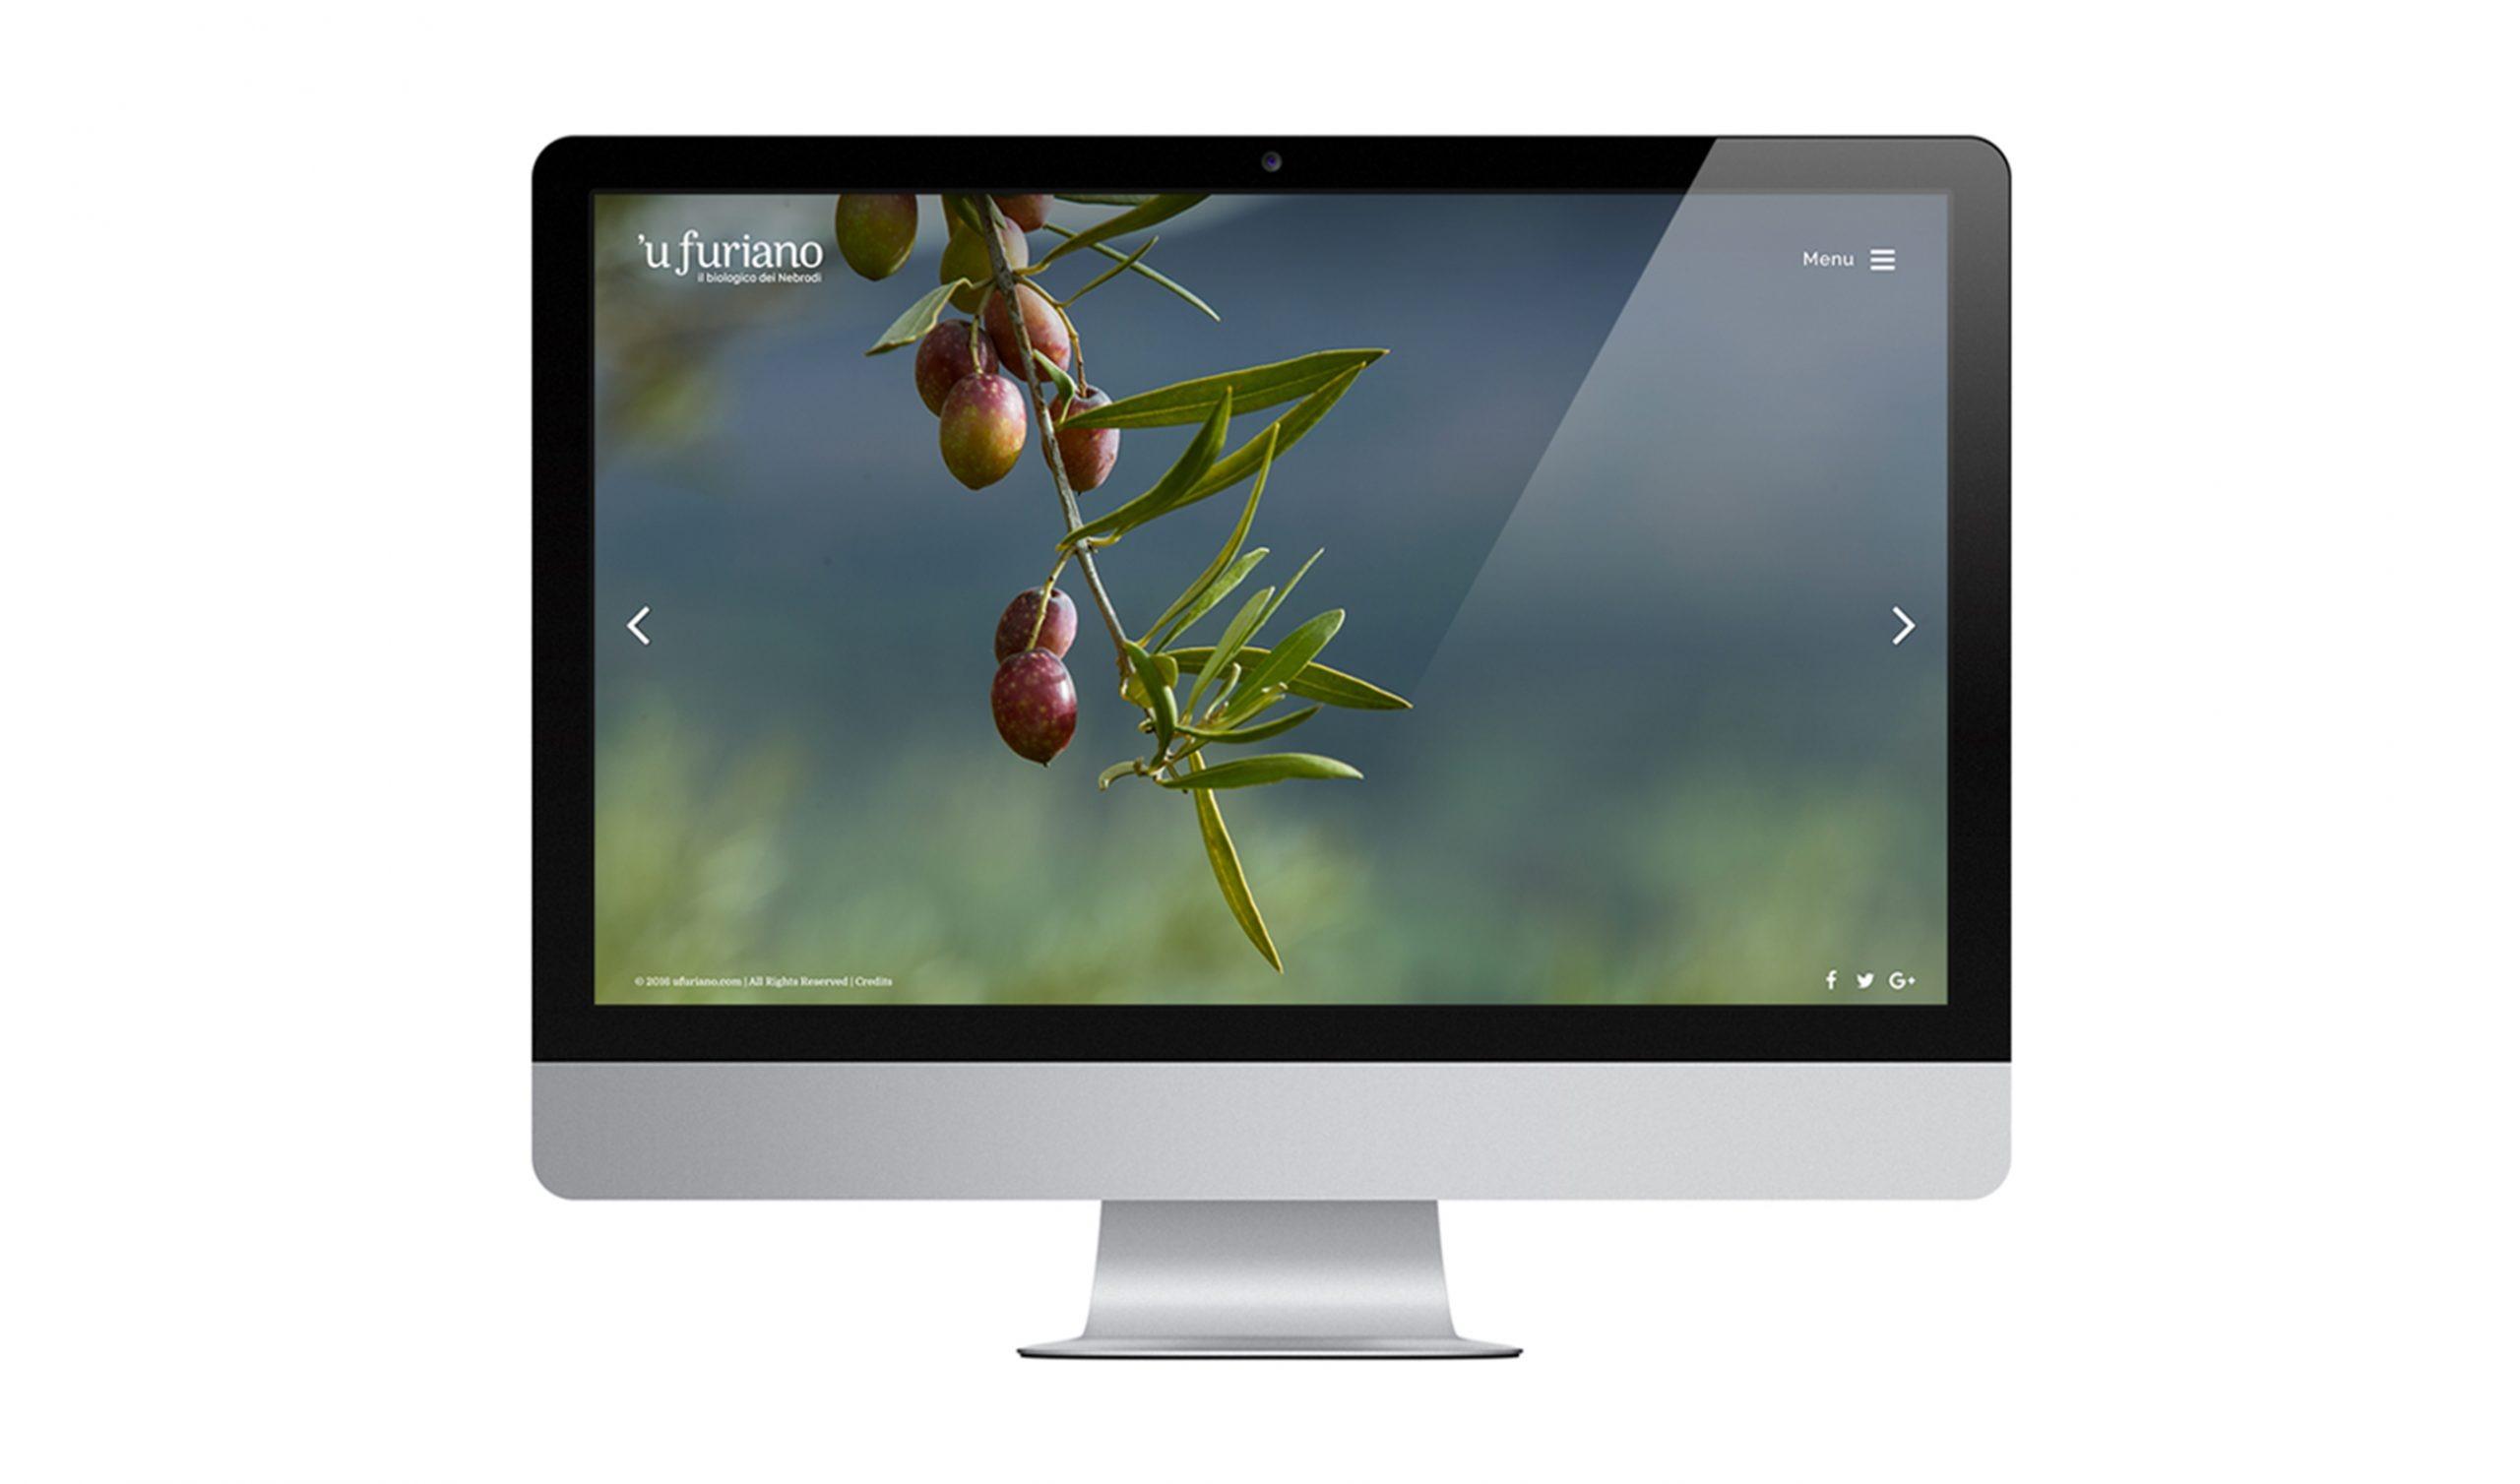 Olio 'u Furiano Website Home